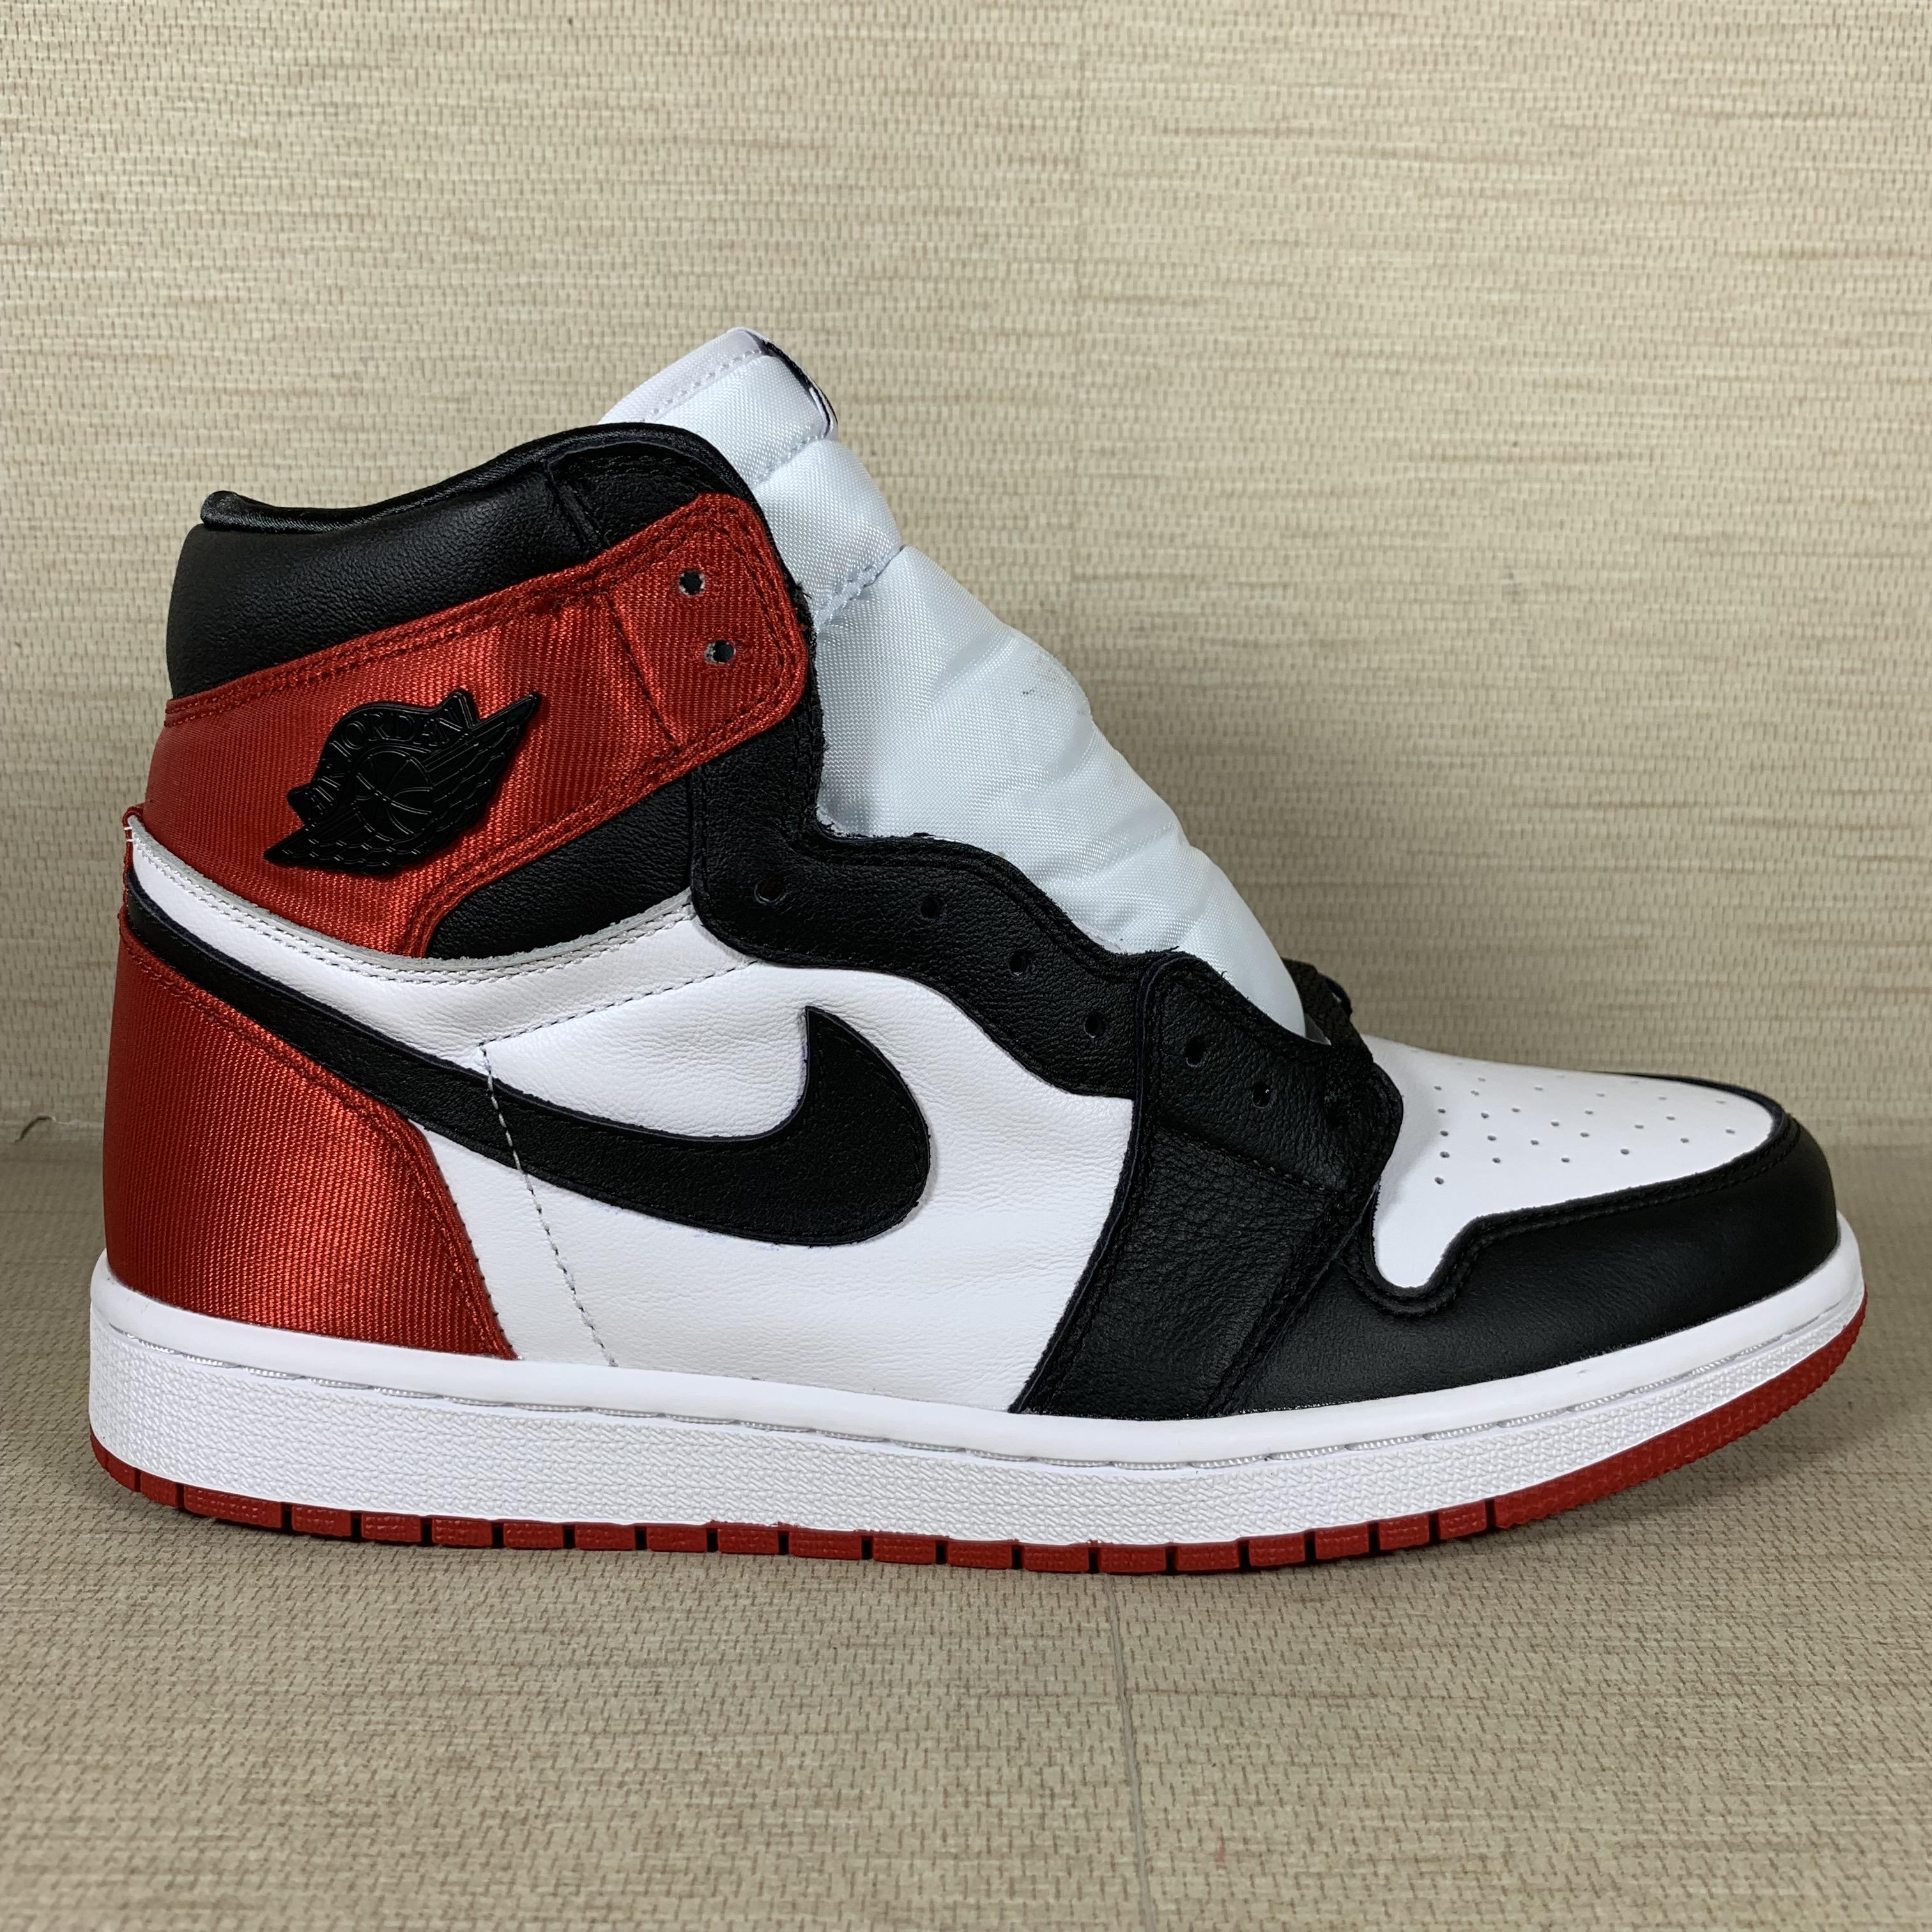 Jordan 1 Retro High Satin Black Toe (W